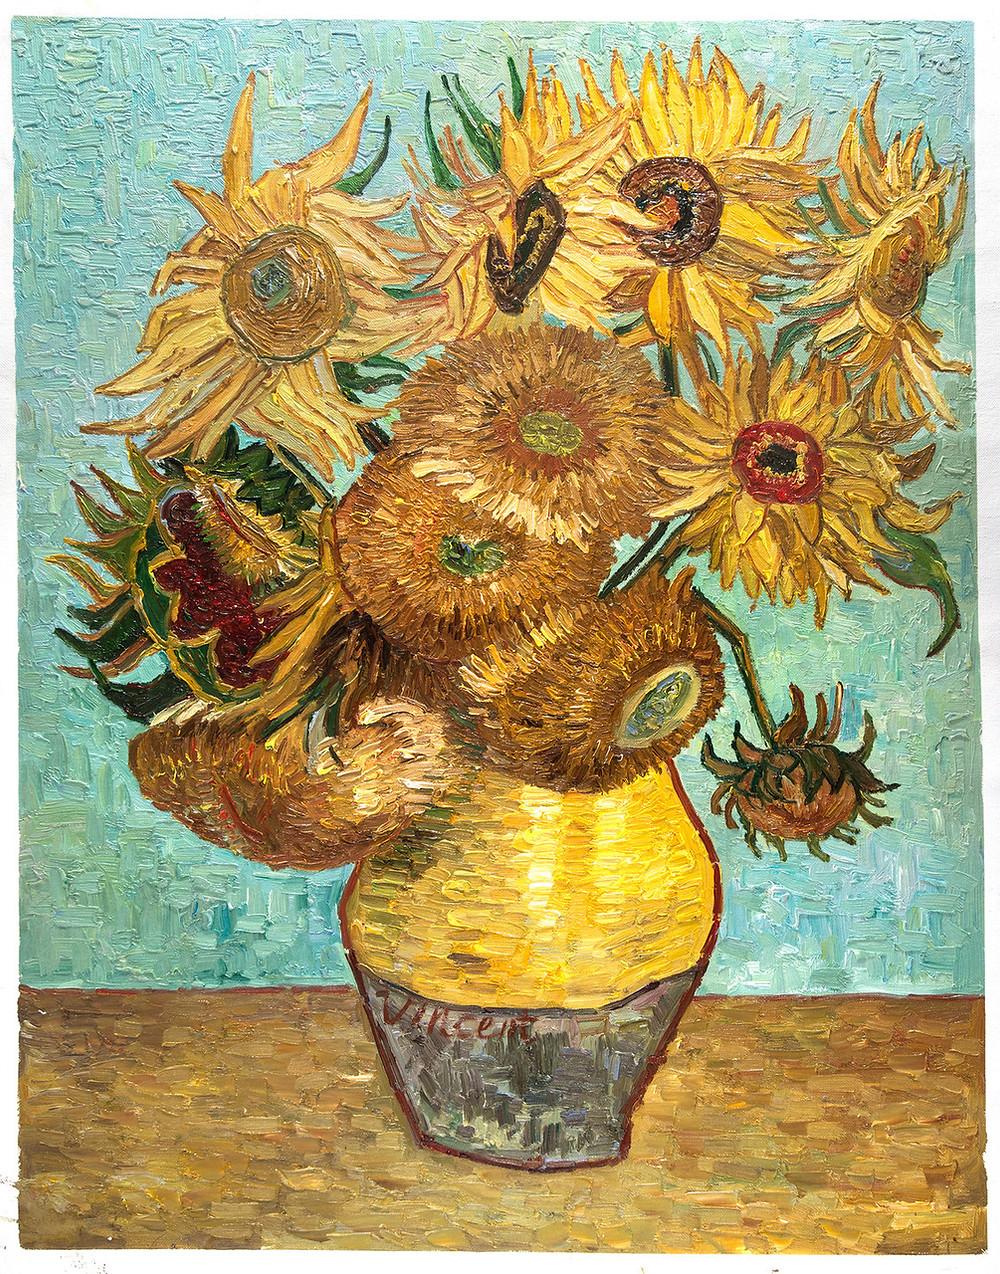 Van Gough's Sunflowers